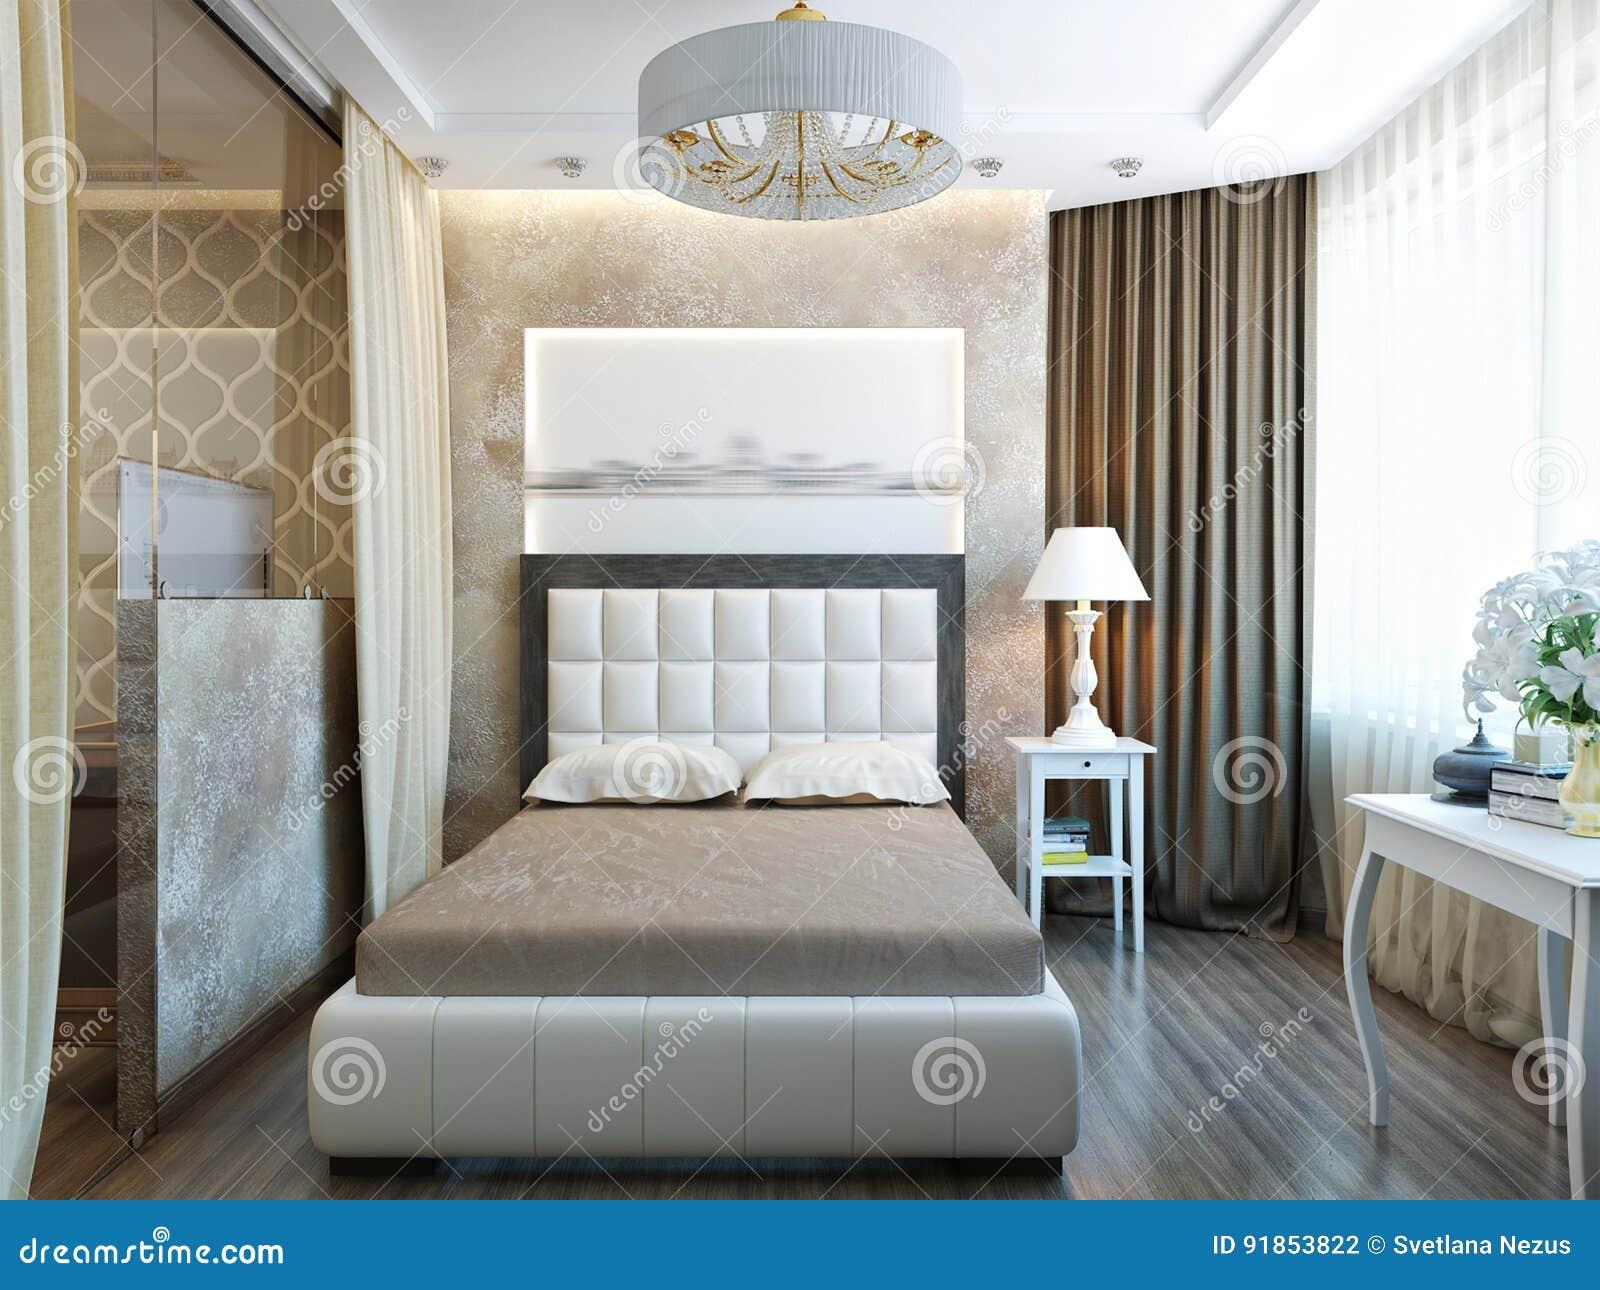 Design Slaapkamer Meubilair : Modern slaapkamer binnenlands ontwerp met wit meubilair stock